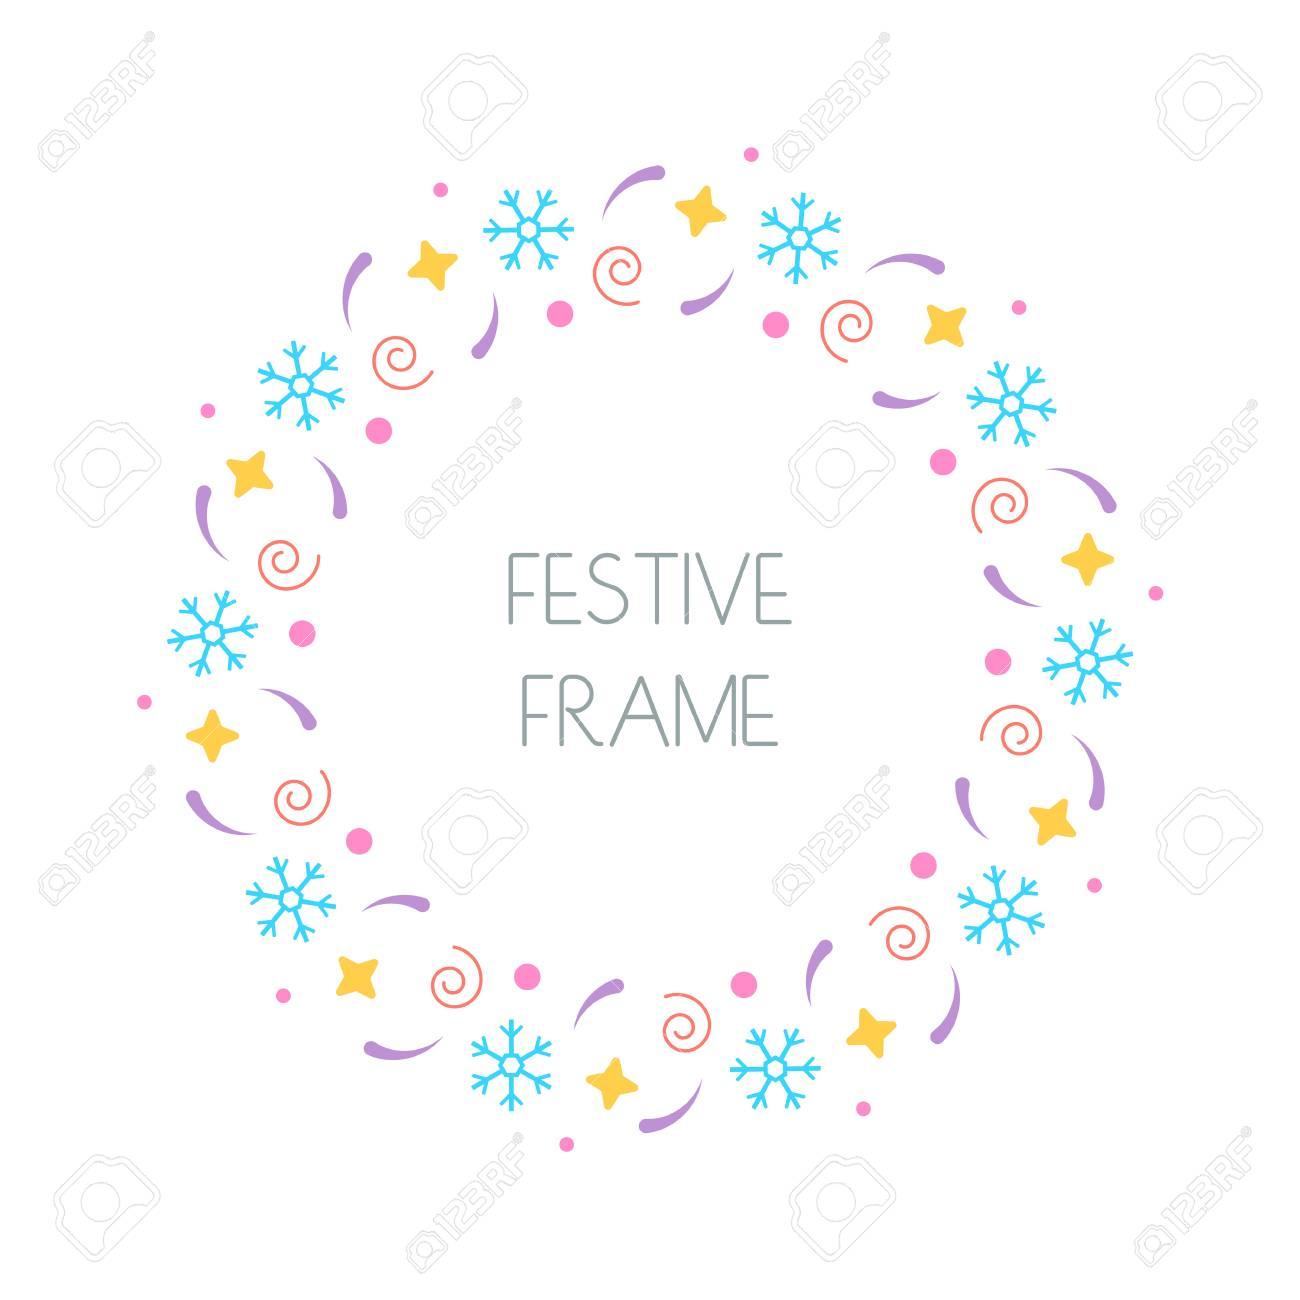 Christmas Cards To Print.Christmas Festive Round Frame For Christmas Cards Invitations